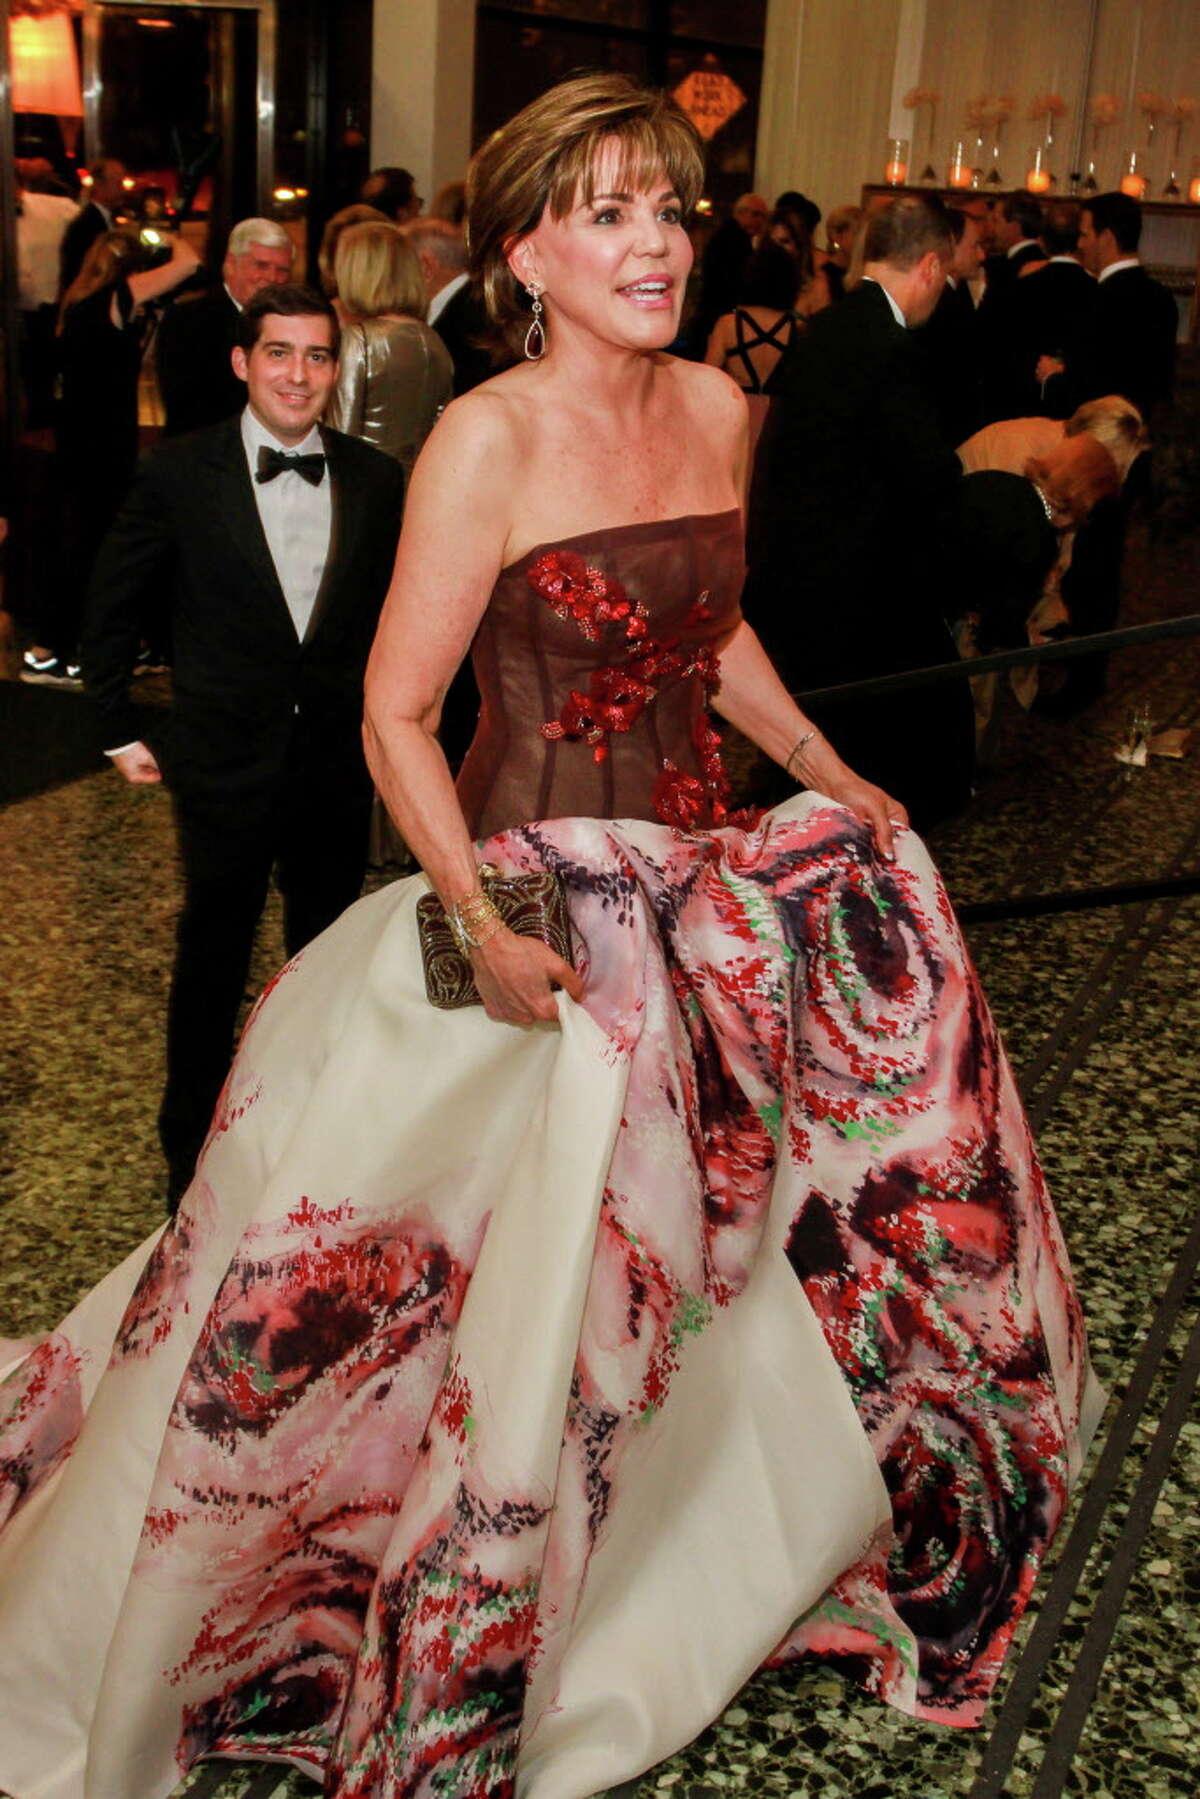 Hallie Vanderhider at the MFAH Grand Gala Ball.